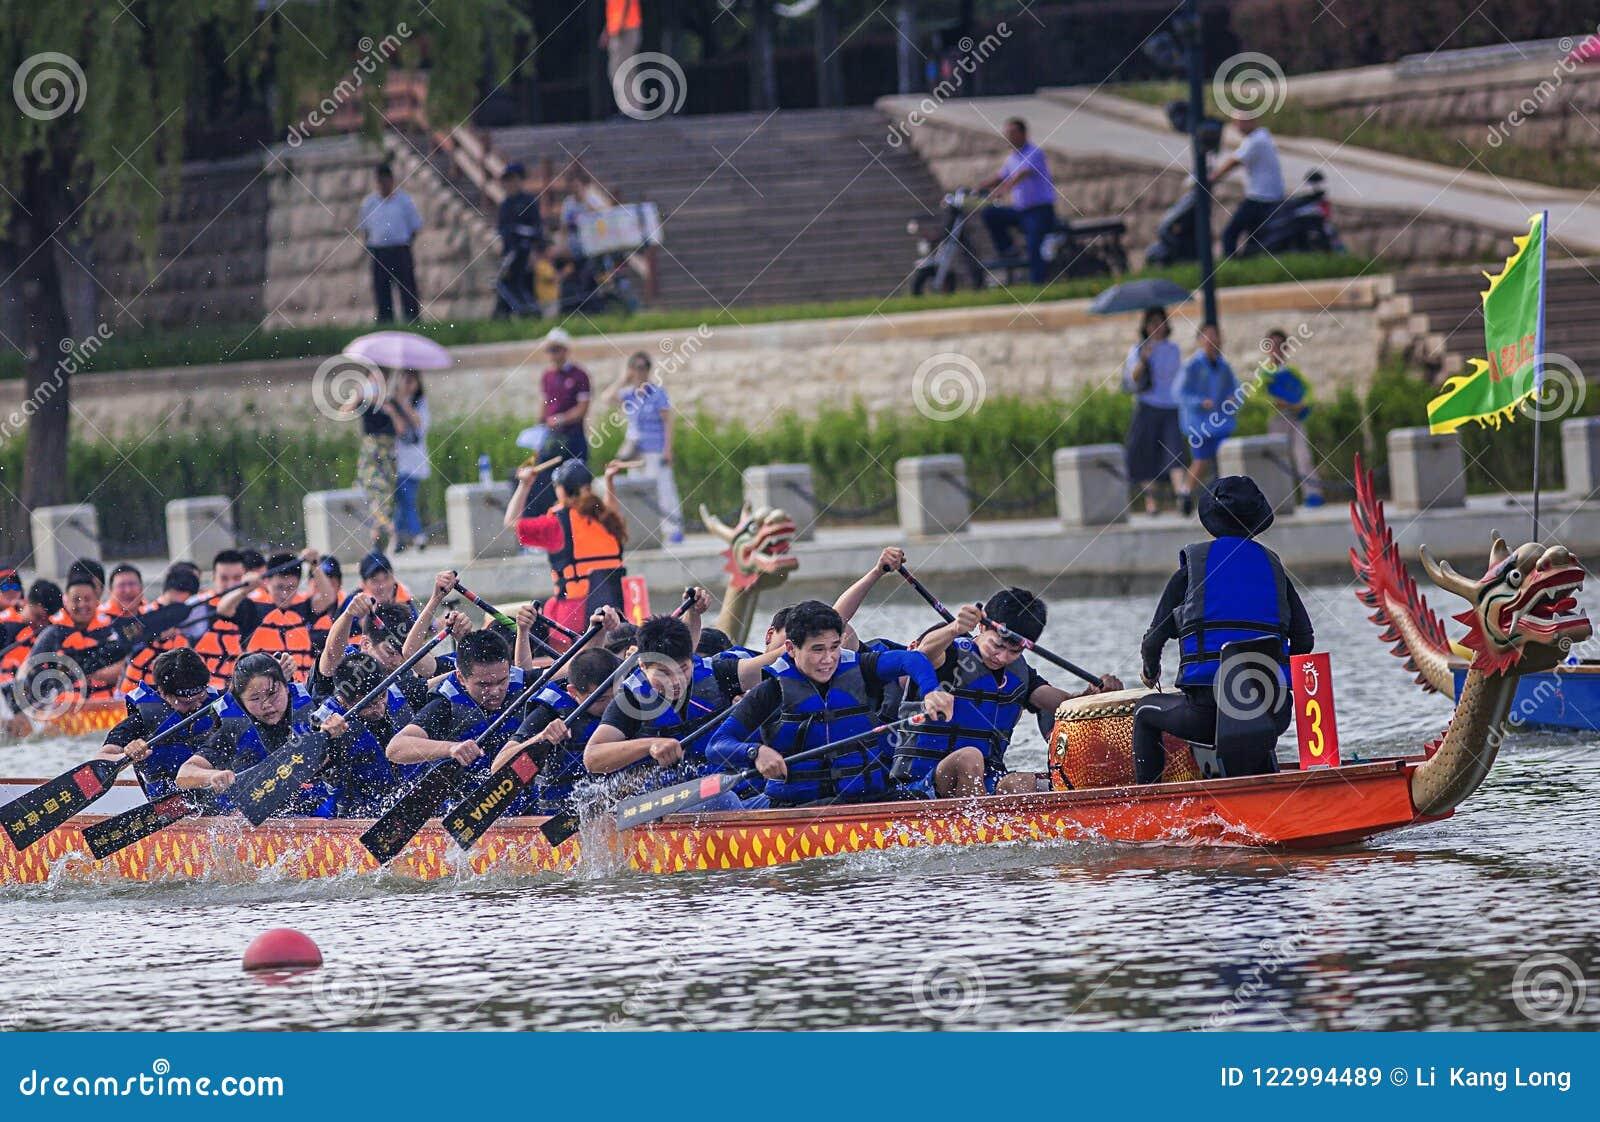 Dragon Boat Race on Dragon Boat Festival